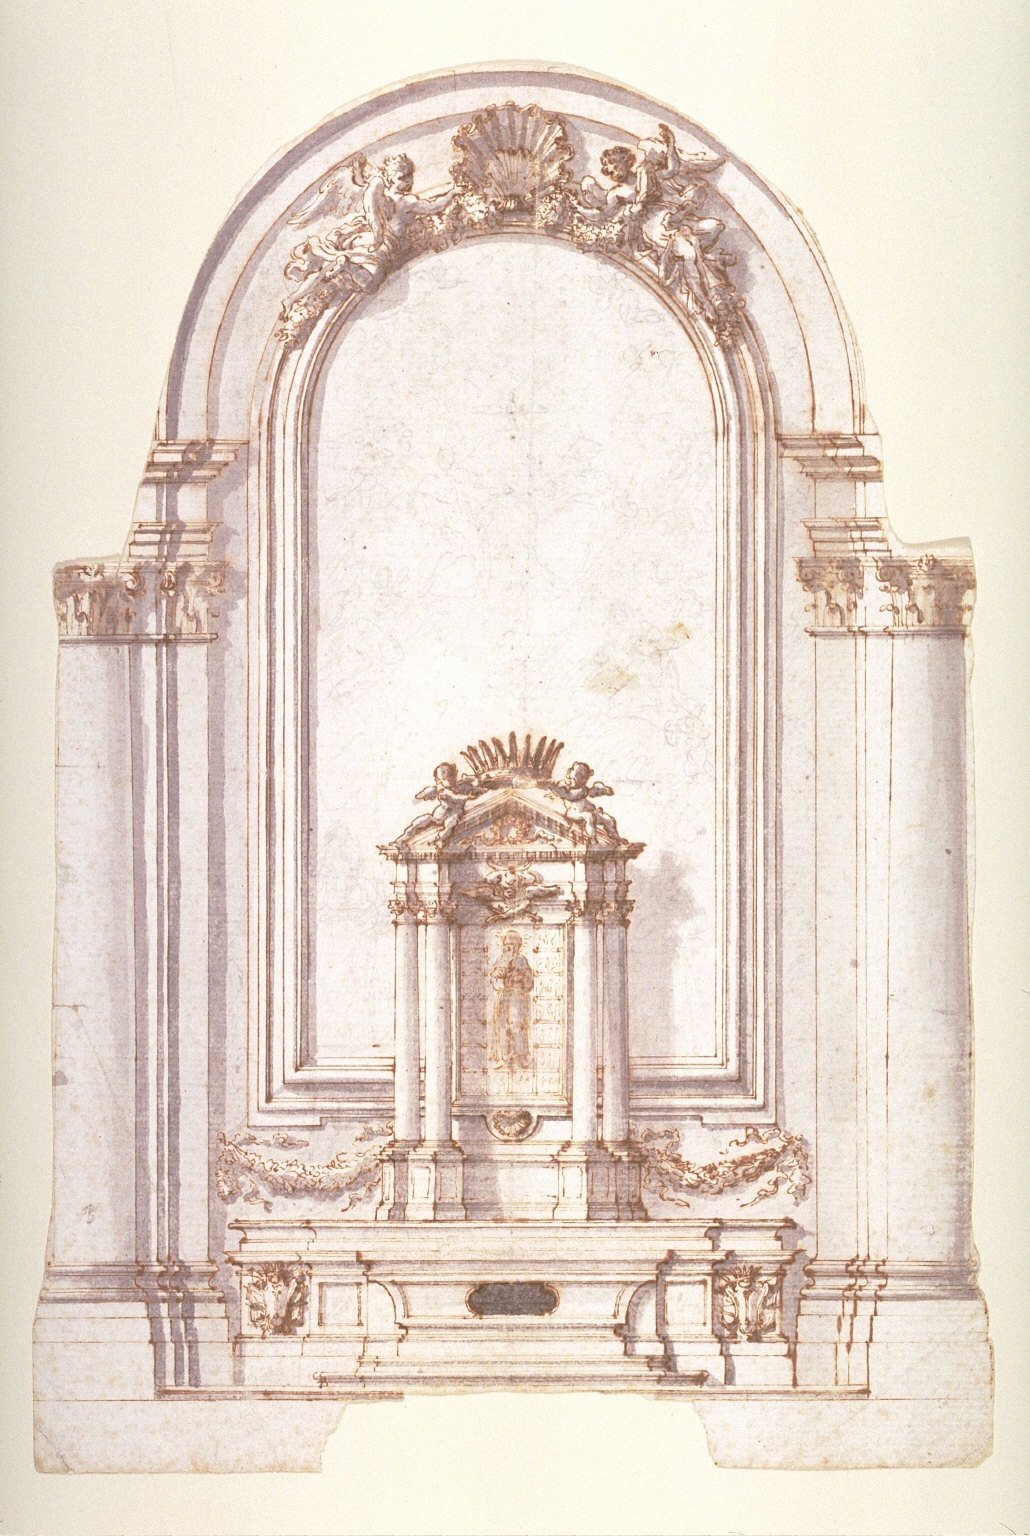 Design for a Church Altar